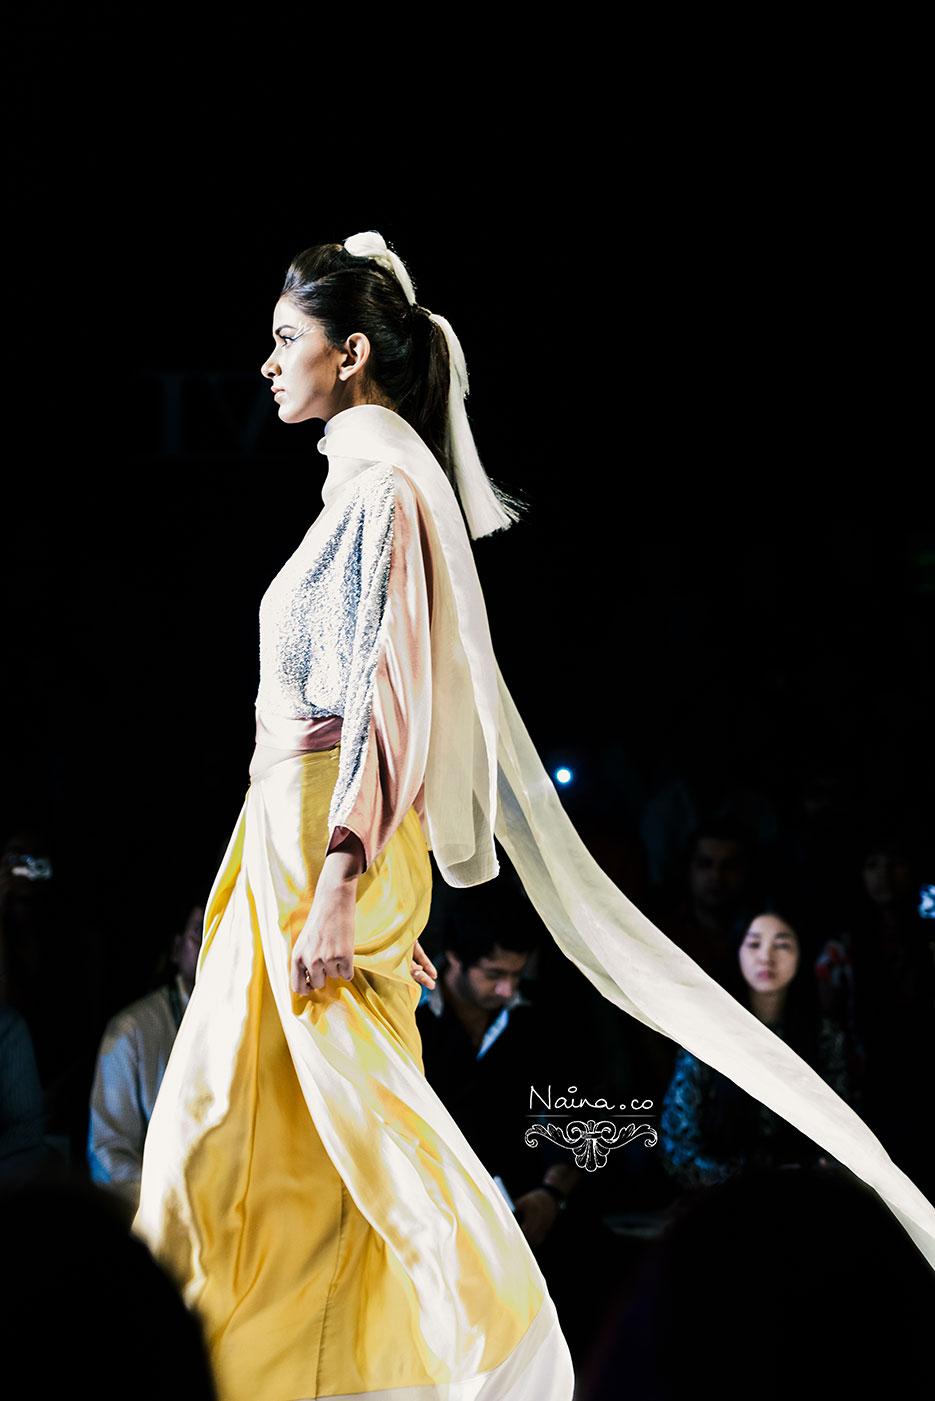 Wills Lifestyle India Fashion Week, Spring Summer 2013. Wendell Rodricks by photographer Naina Redhu of Naina.co